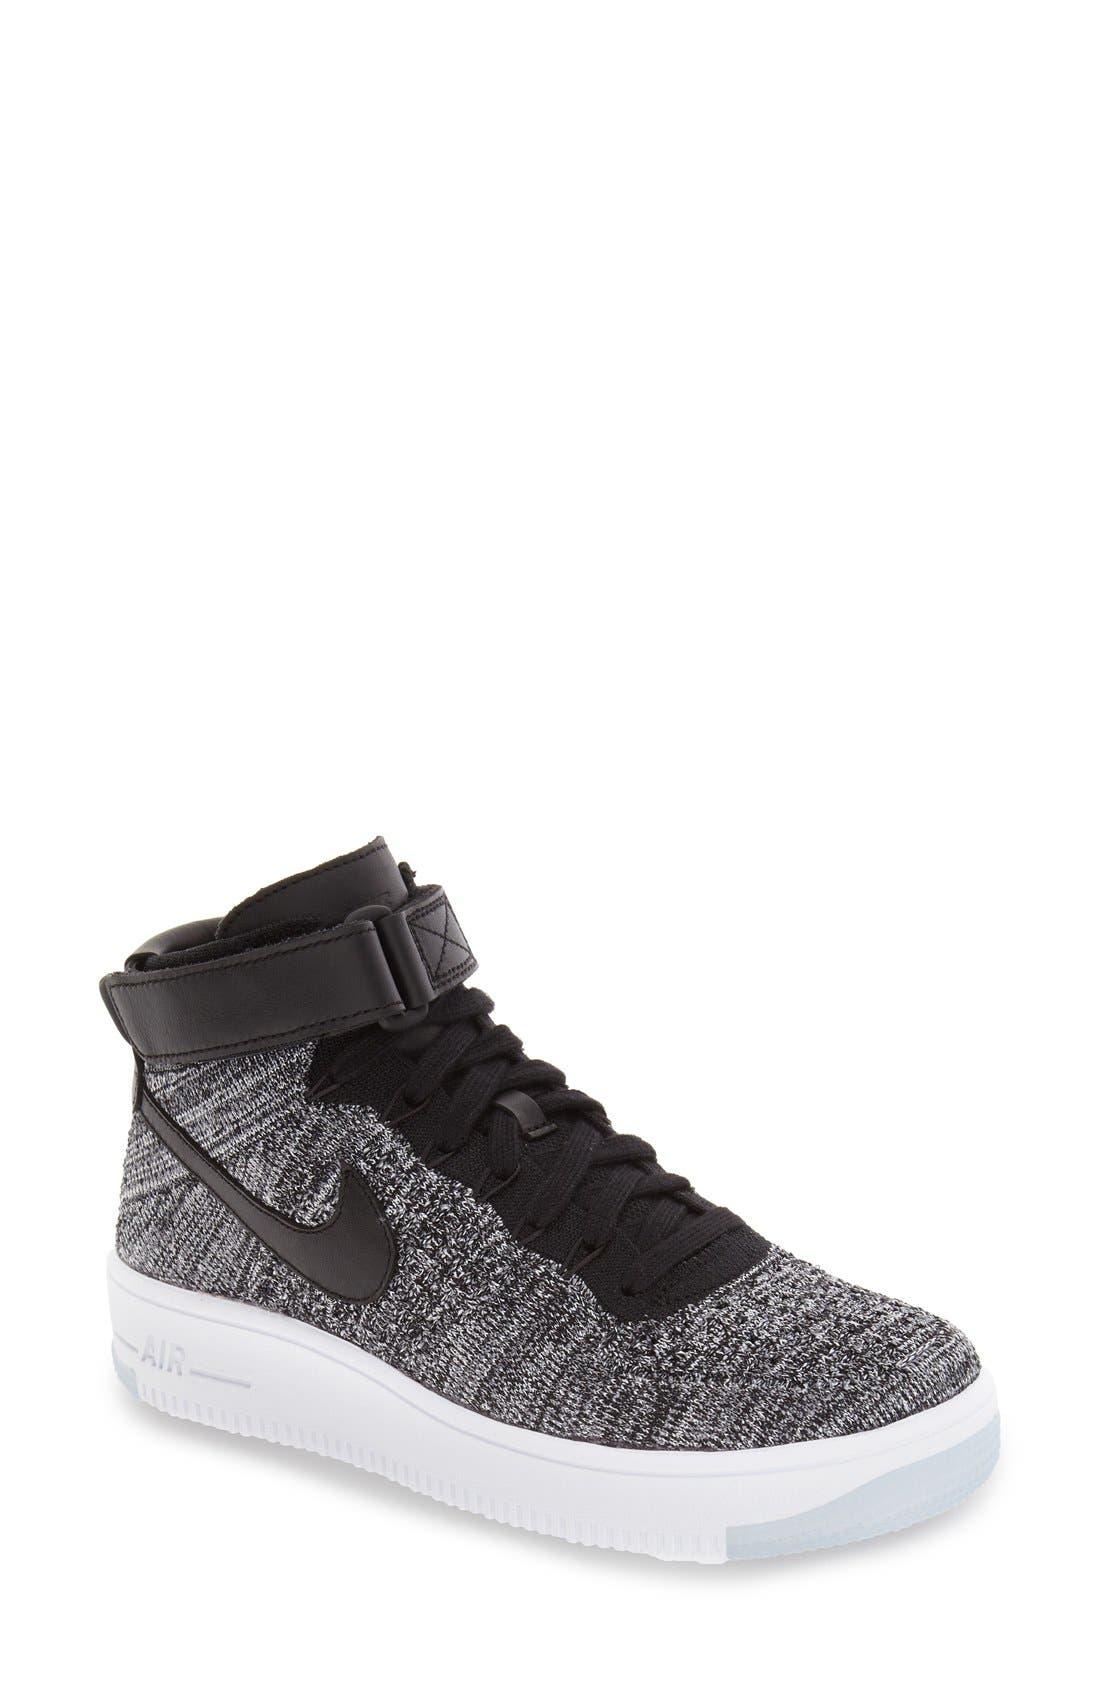 Alternate Image 1 Selected - Nike 'Air Force 1 Flyknit' Sneaker (Women)